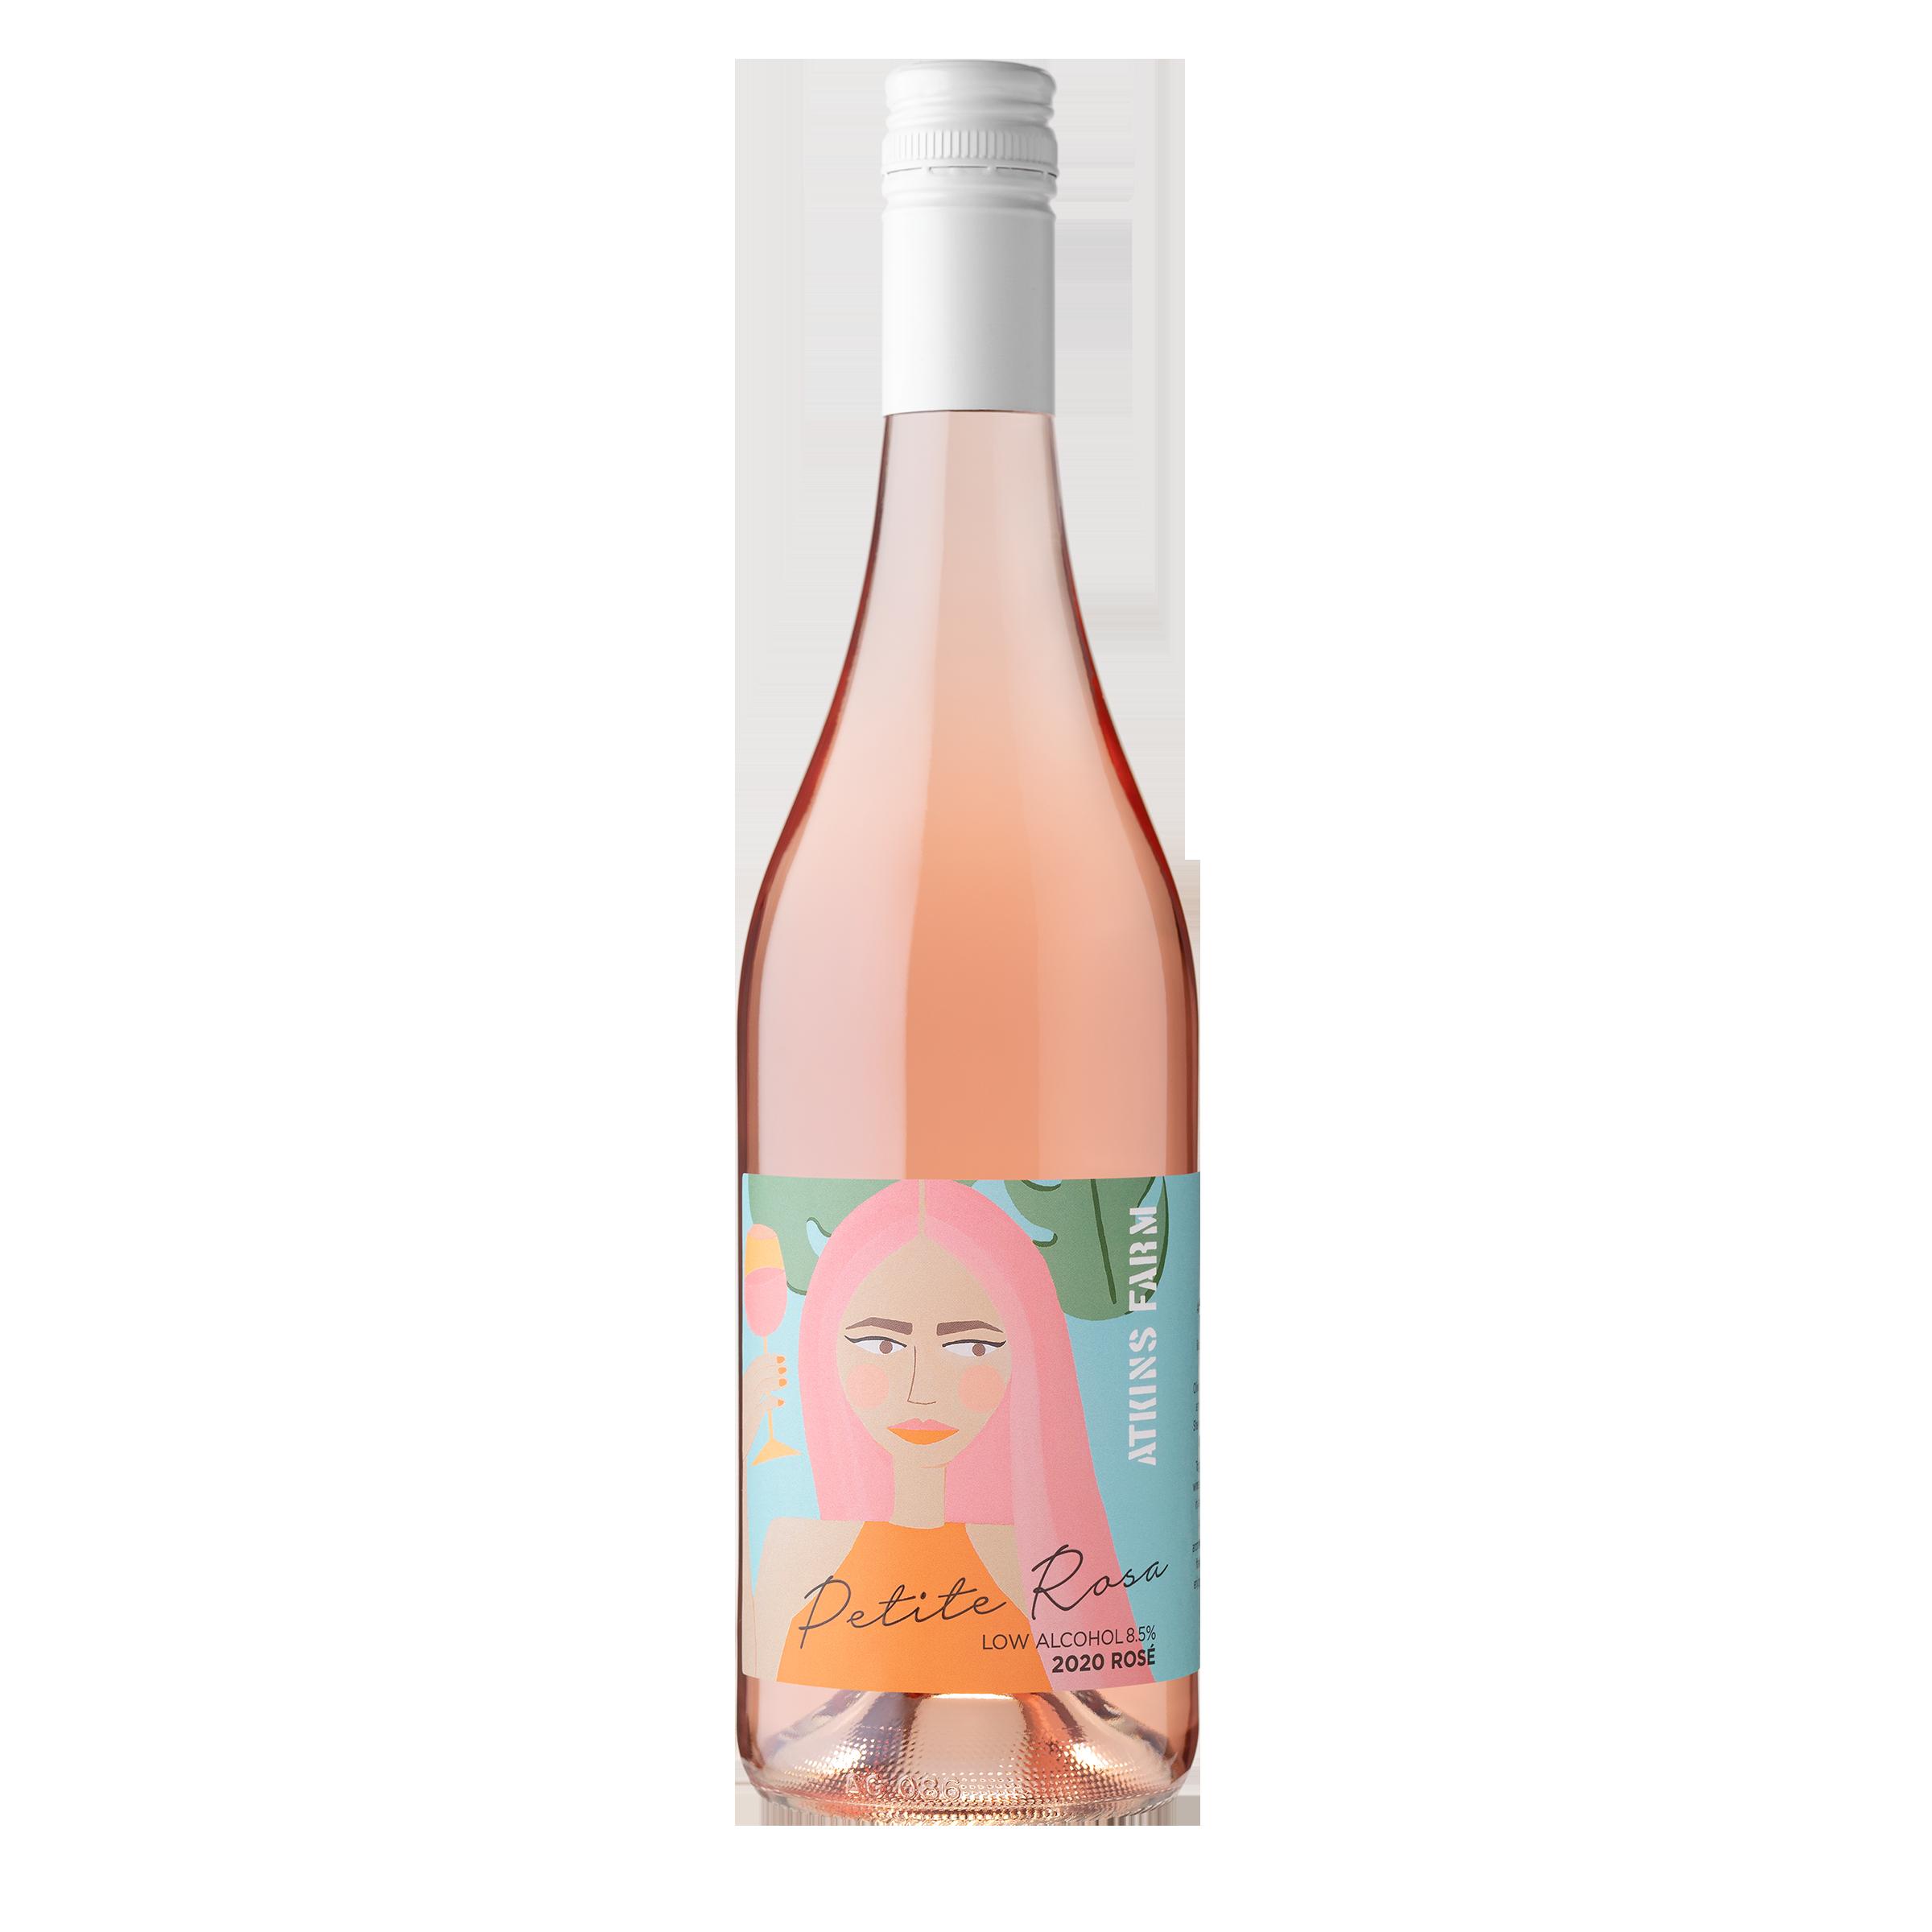 Atkins Farm 'Petite Rosa' Low-Alc Rosé 2020 750ml